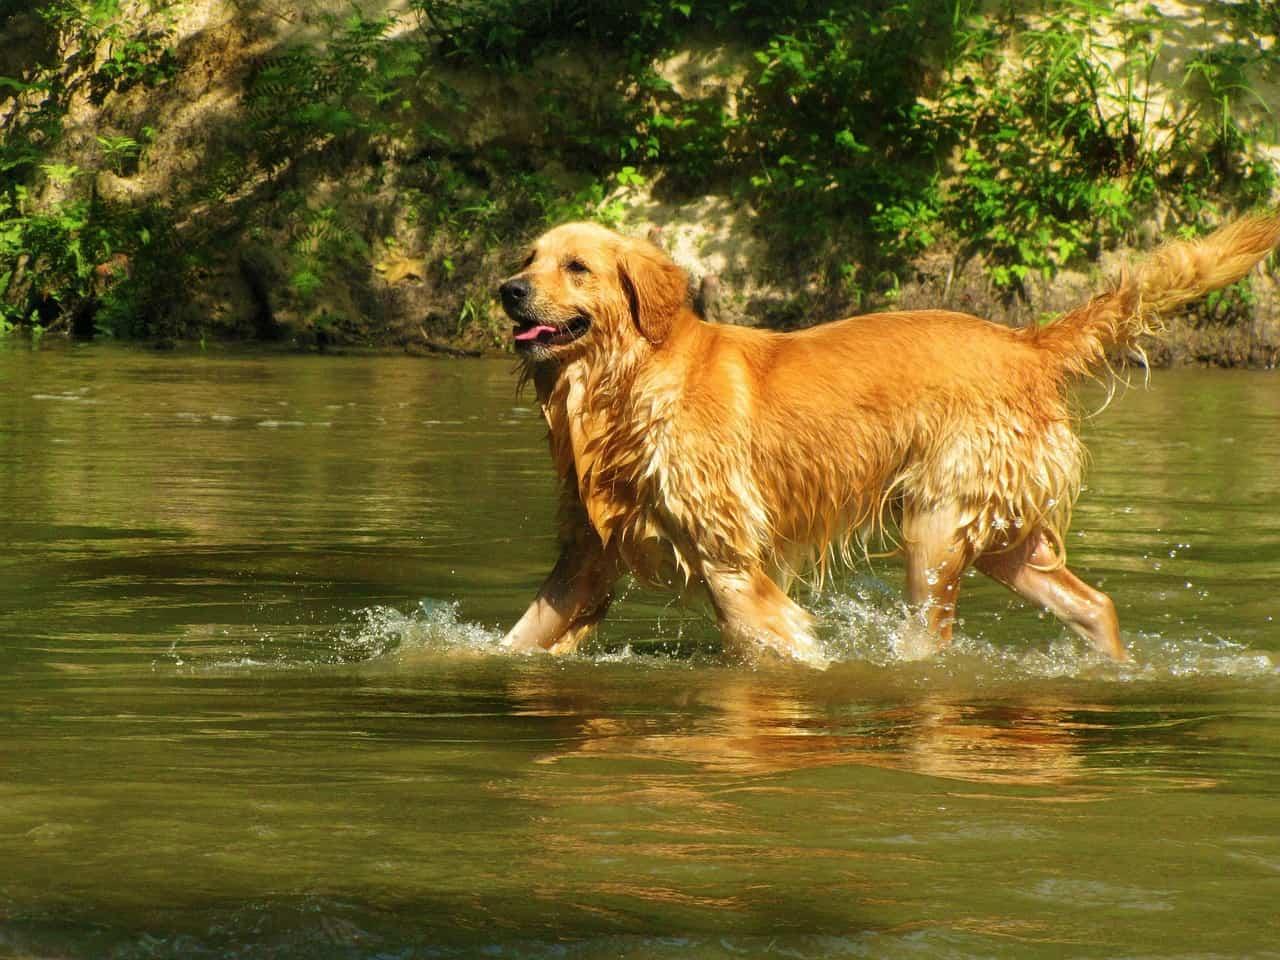 Golden Retriever running in the water